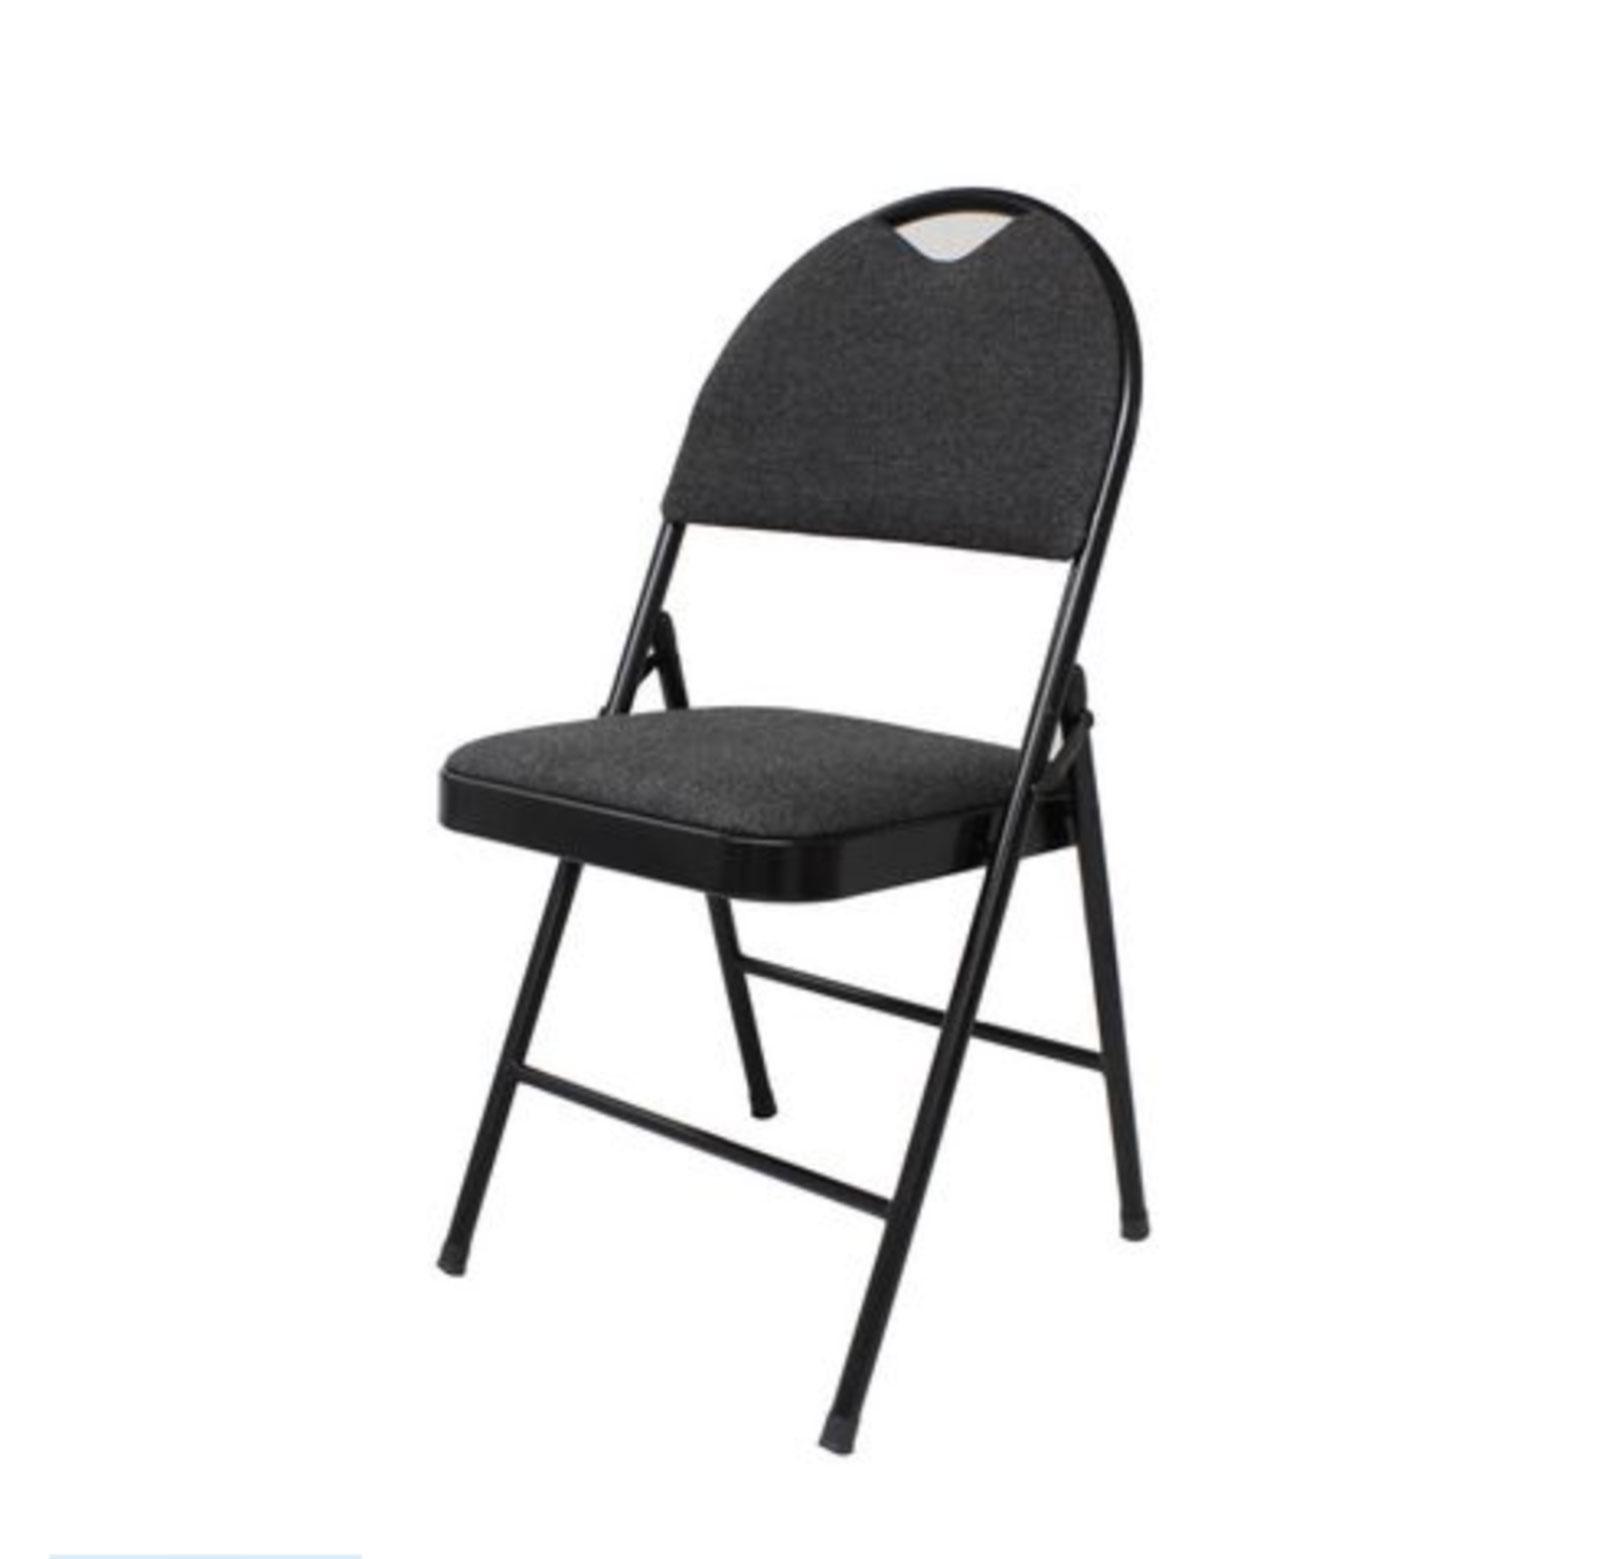 Folding Padded Chairs – Black